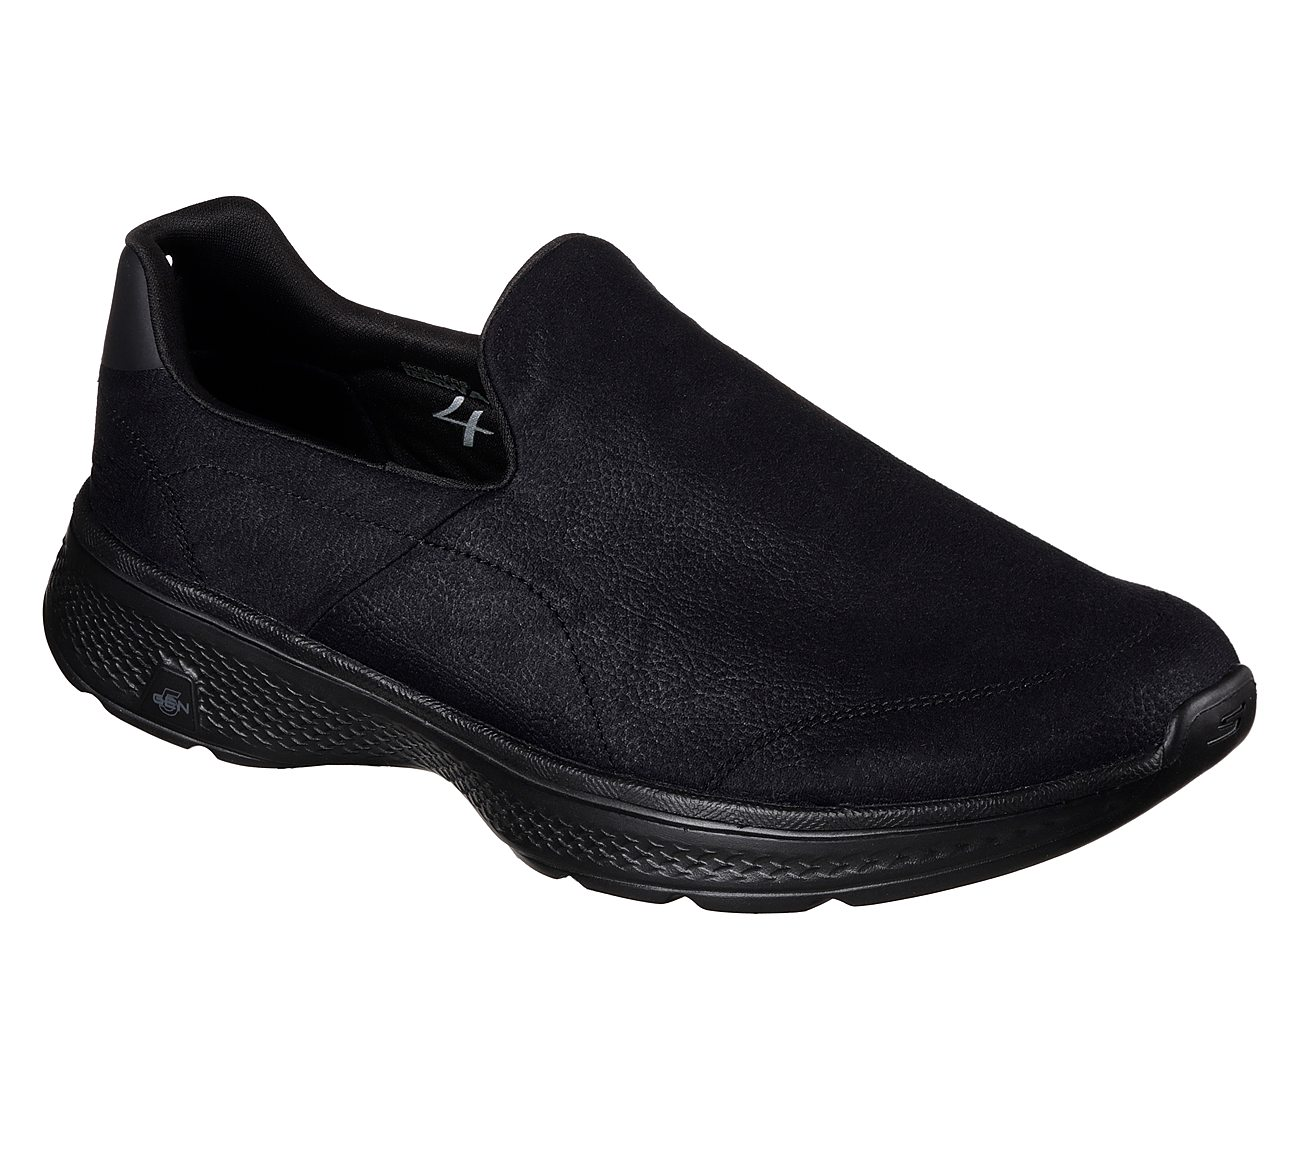 Buy SKECHERS Skechers GOwalk 4